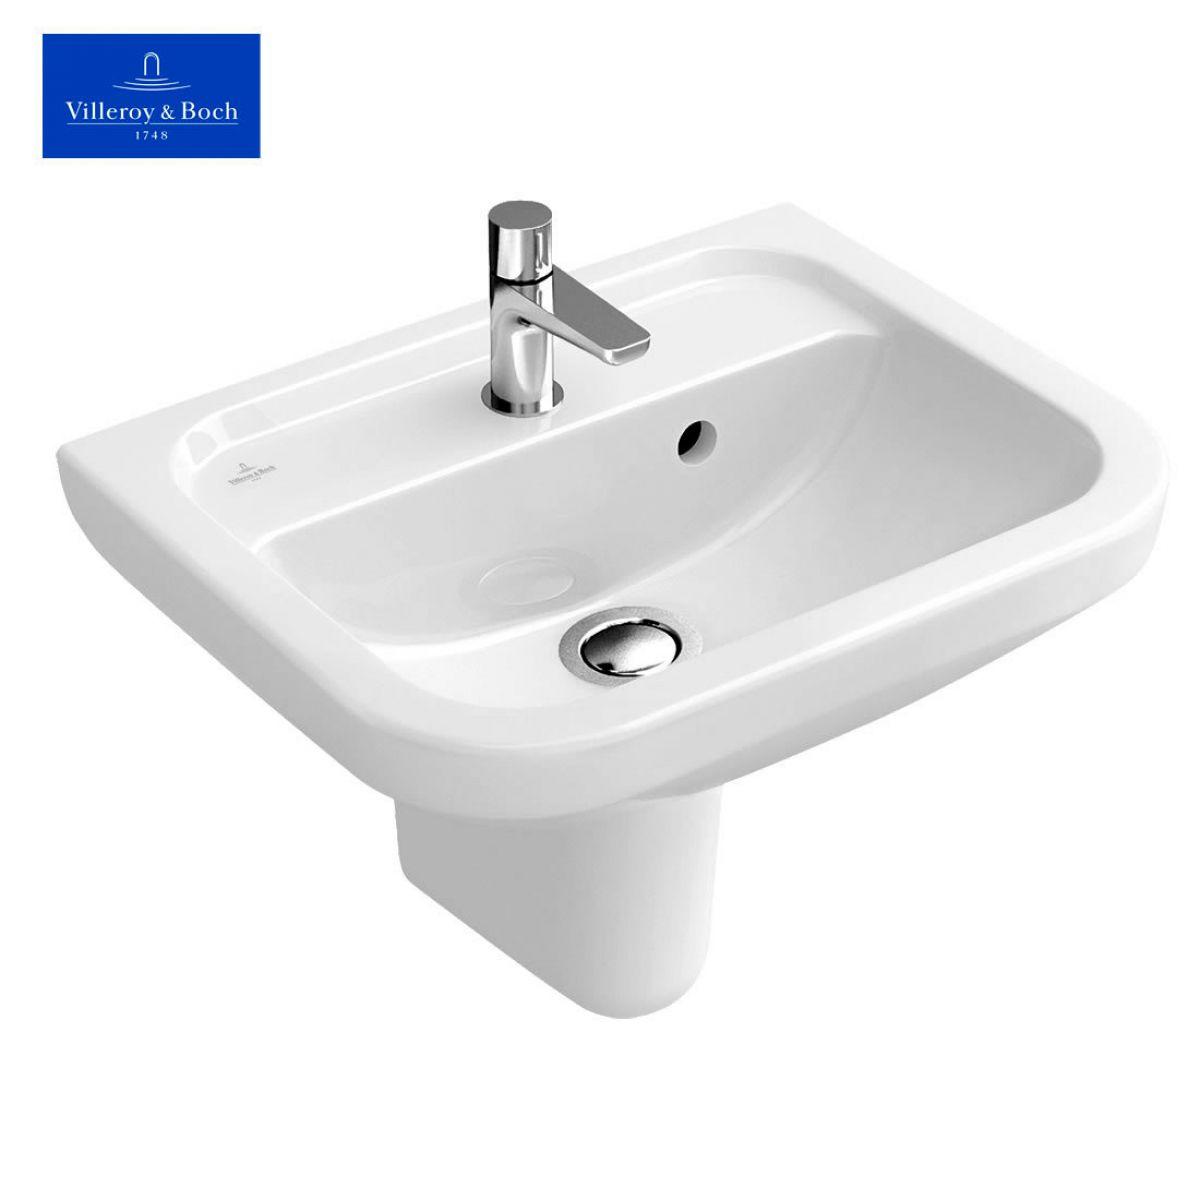 v b architectura compact hand washbasin uk bathrooms. Black Bedroom Furniture Sets. Home Design Ideas